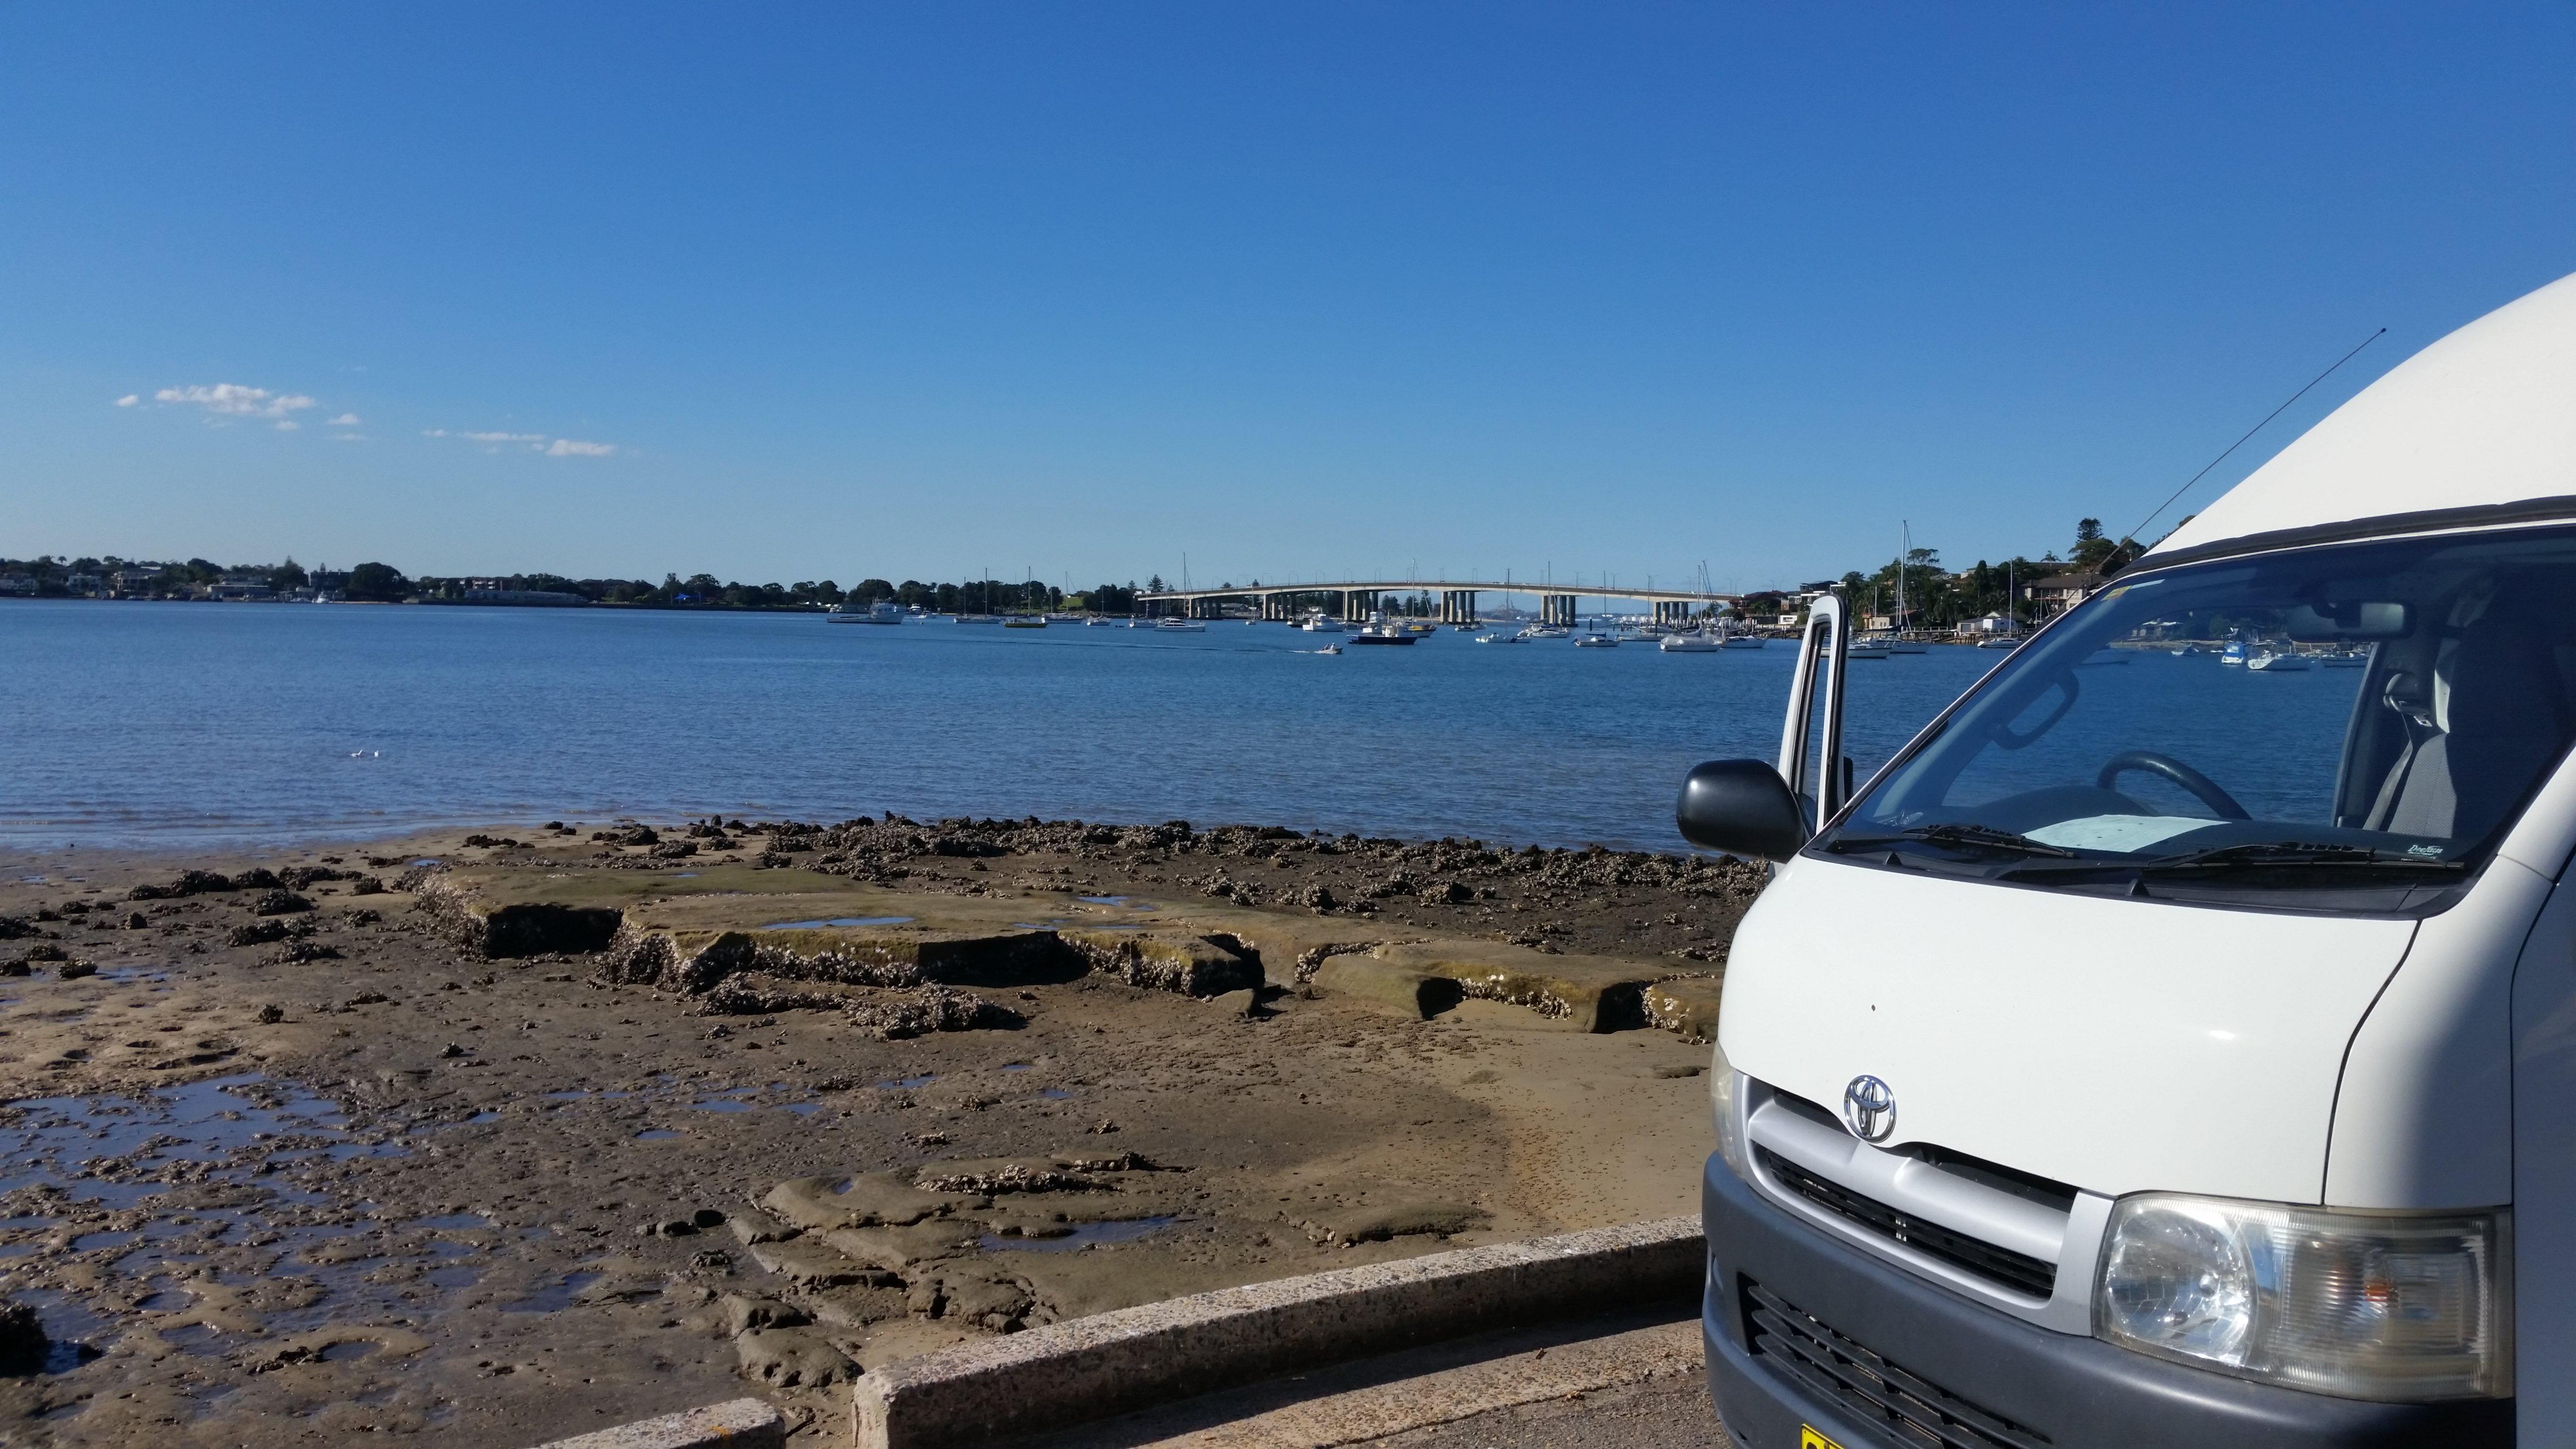 Hi-Top Overlooking the Sea 1 - Motorhome Rental Canberra - Campervan Rental Shop